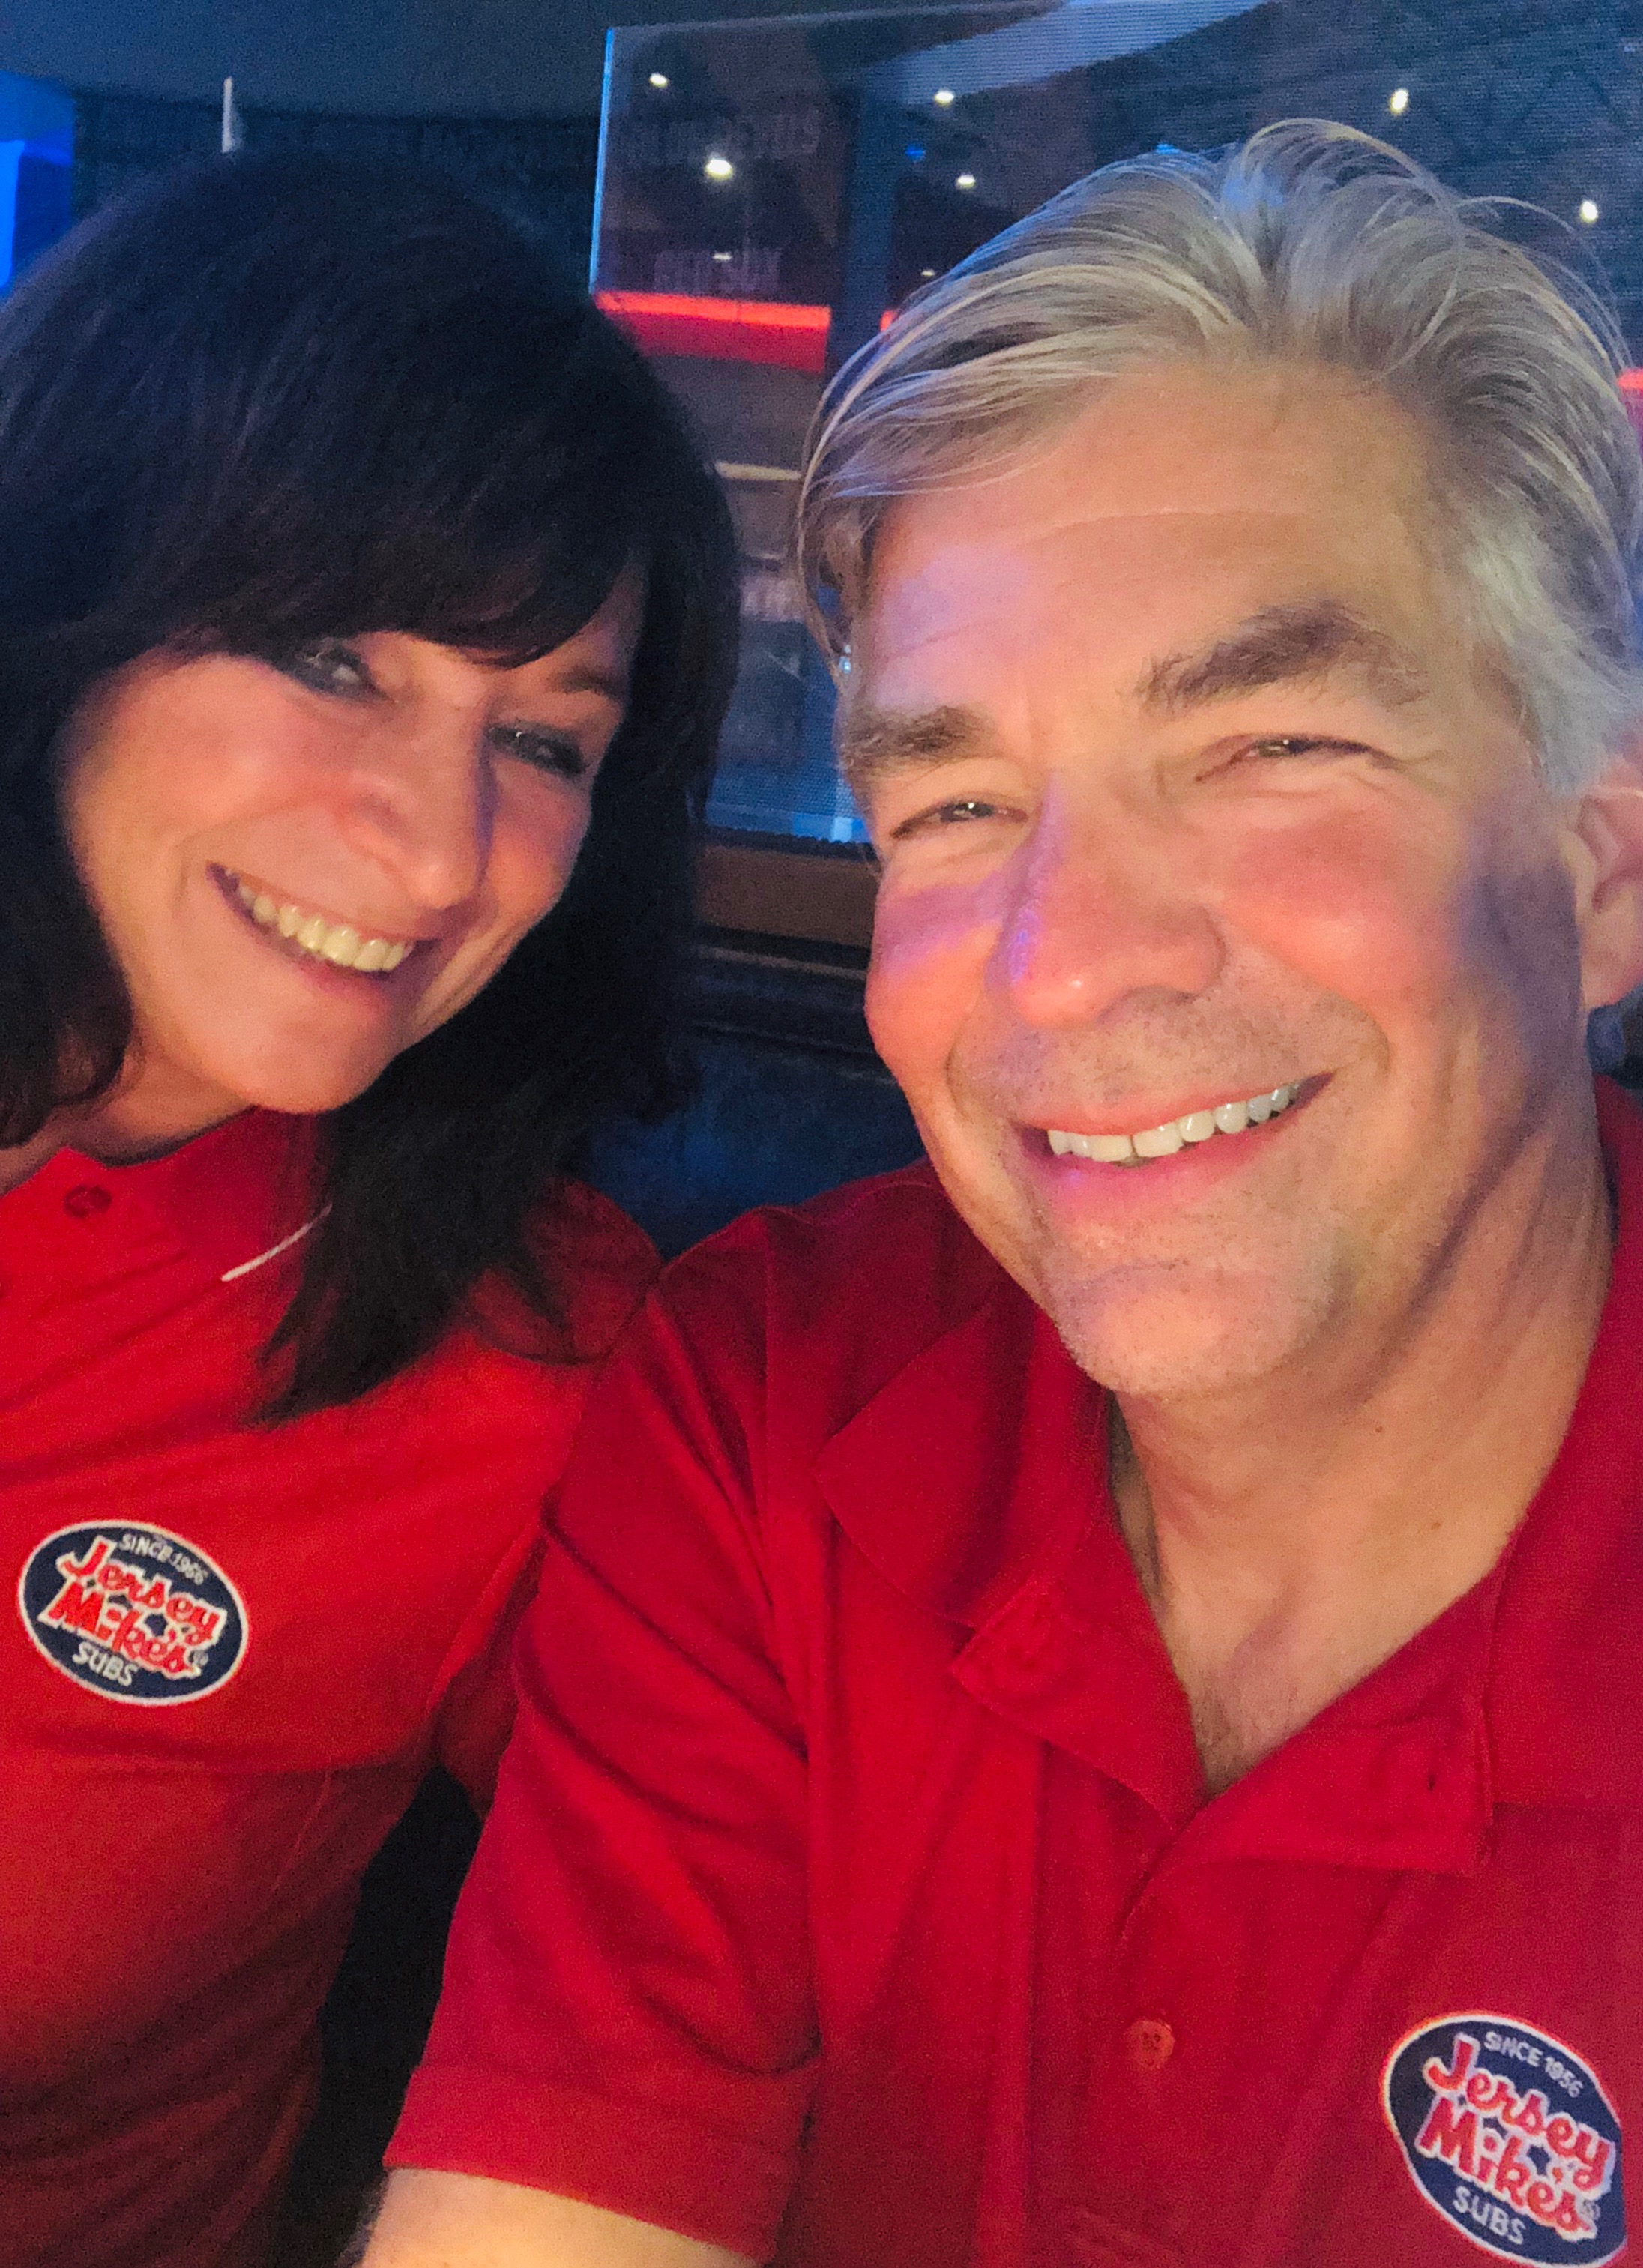 Ken Schanke & Audrey Poynton - CO-OWNERS Manchester CT